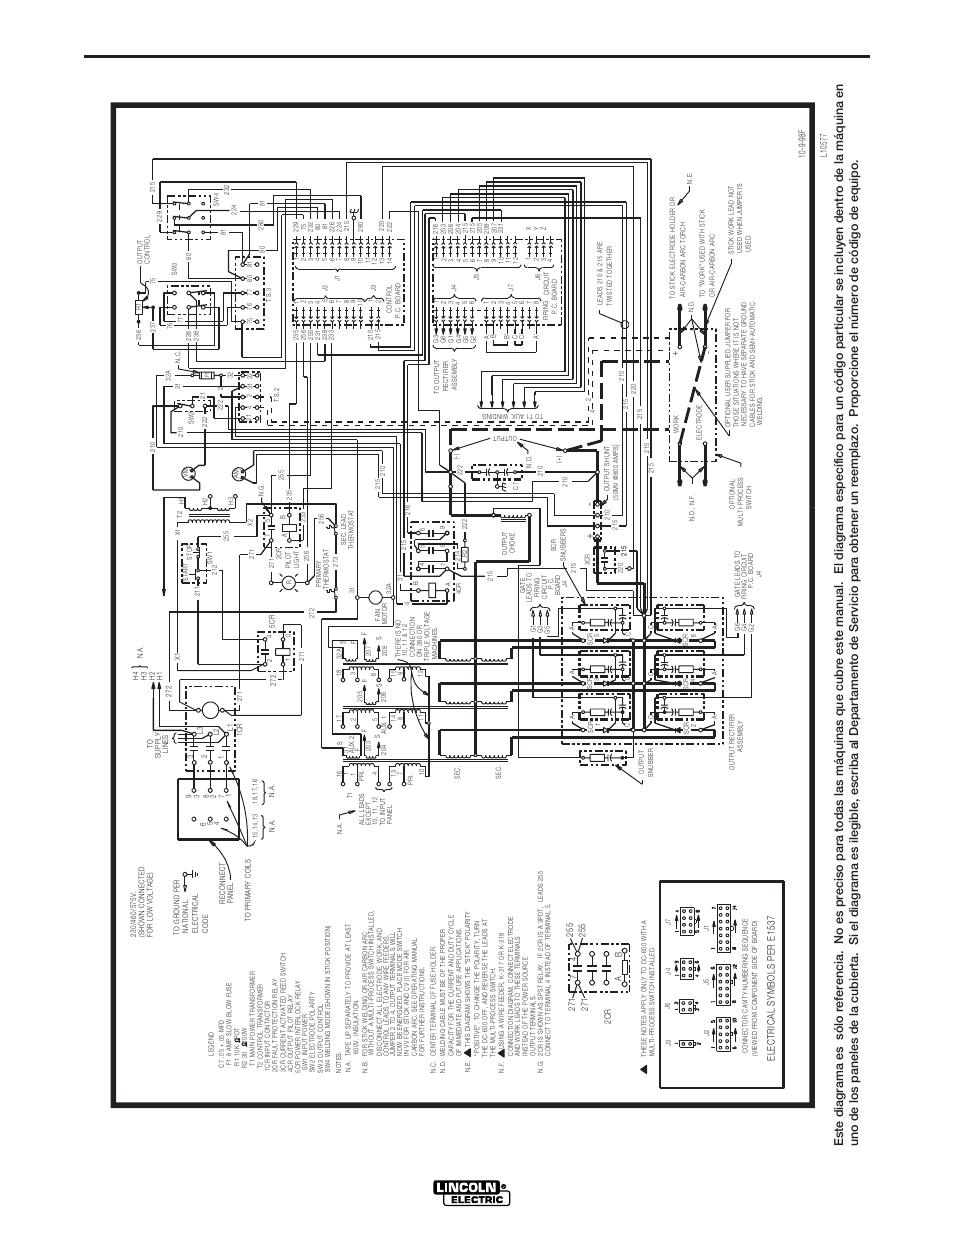 medium resolution of 2006 lincoln navigator wiring diagrams diagramas idealarc dc 600 lincoln electric im306